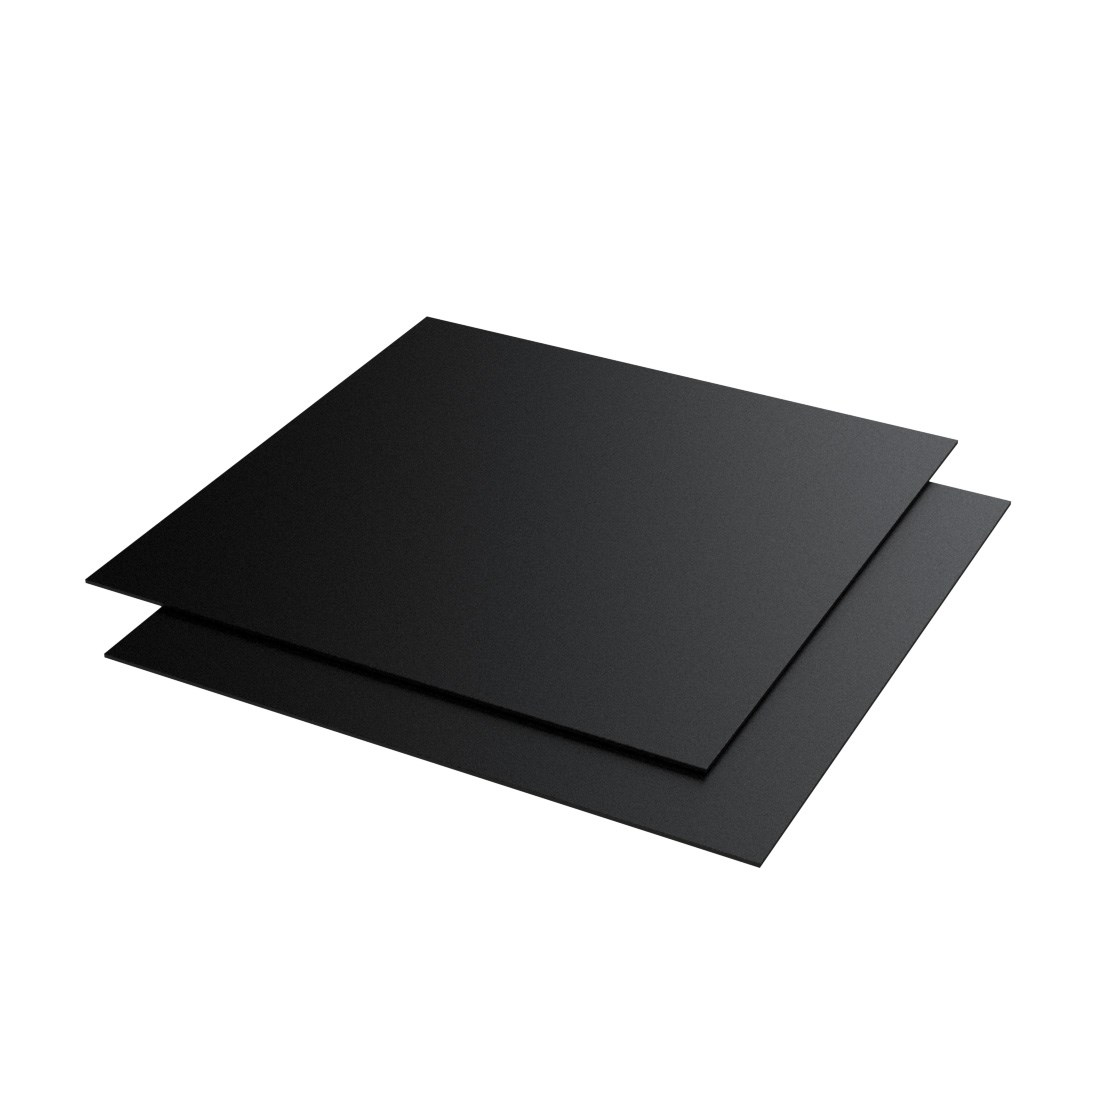 Evacast PP N16 Zwart 7700 Zand/mat 1400x1000x0,5mm